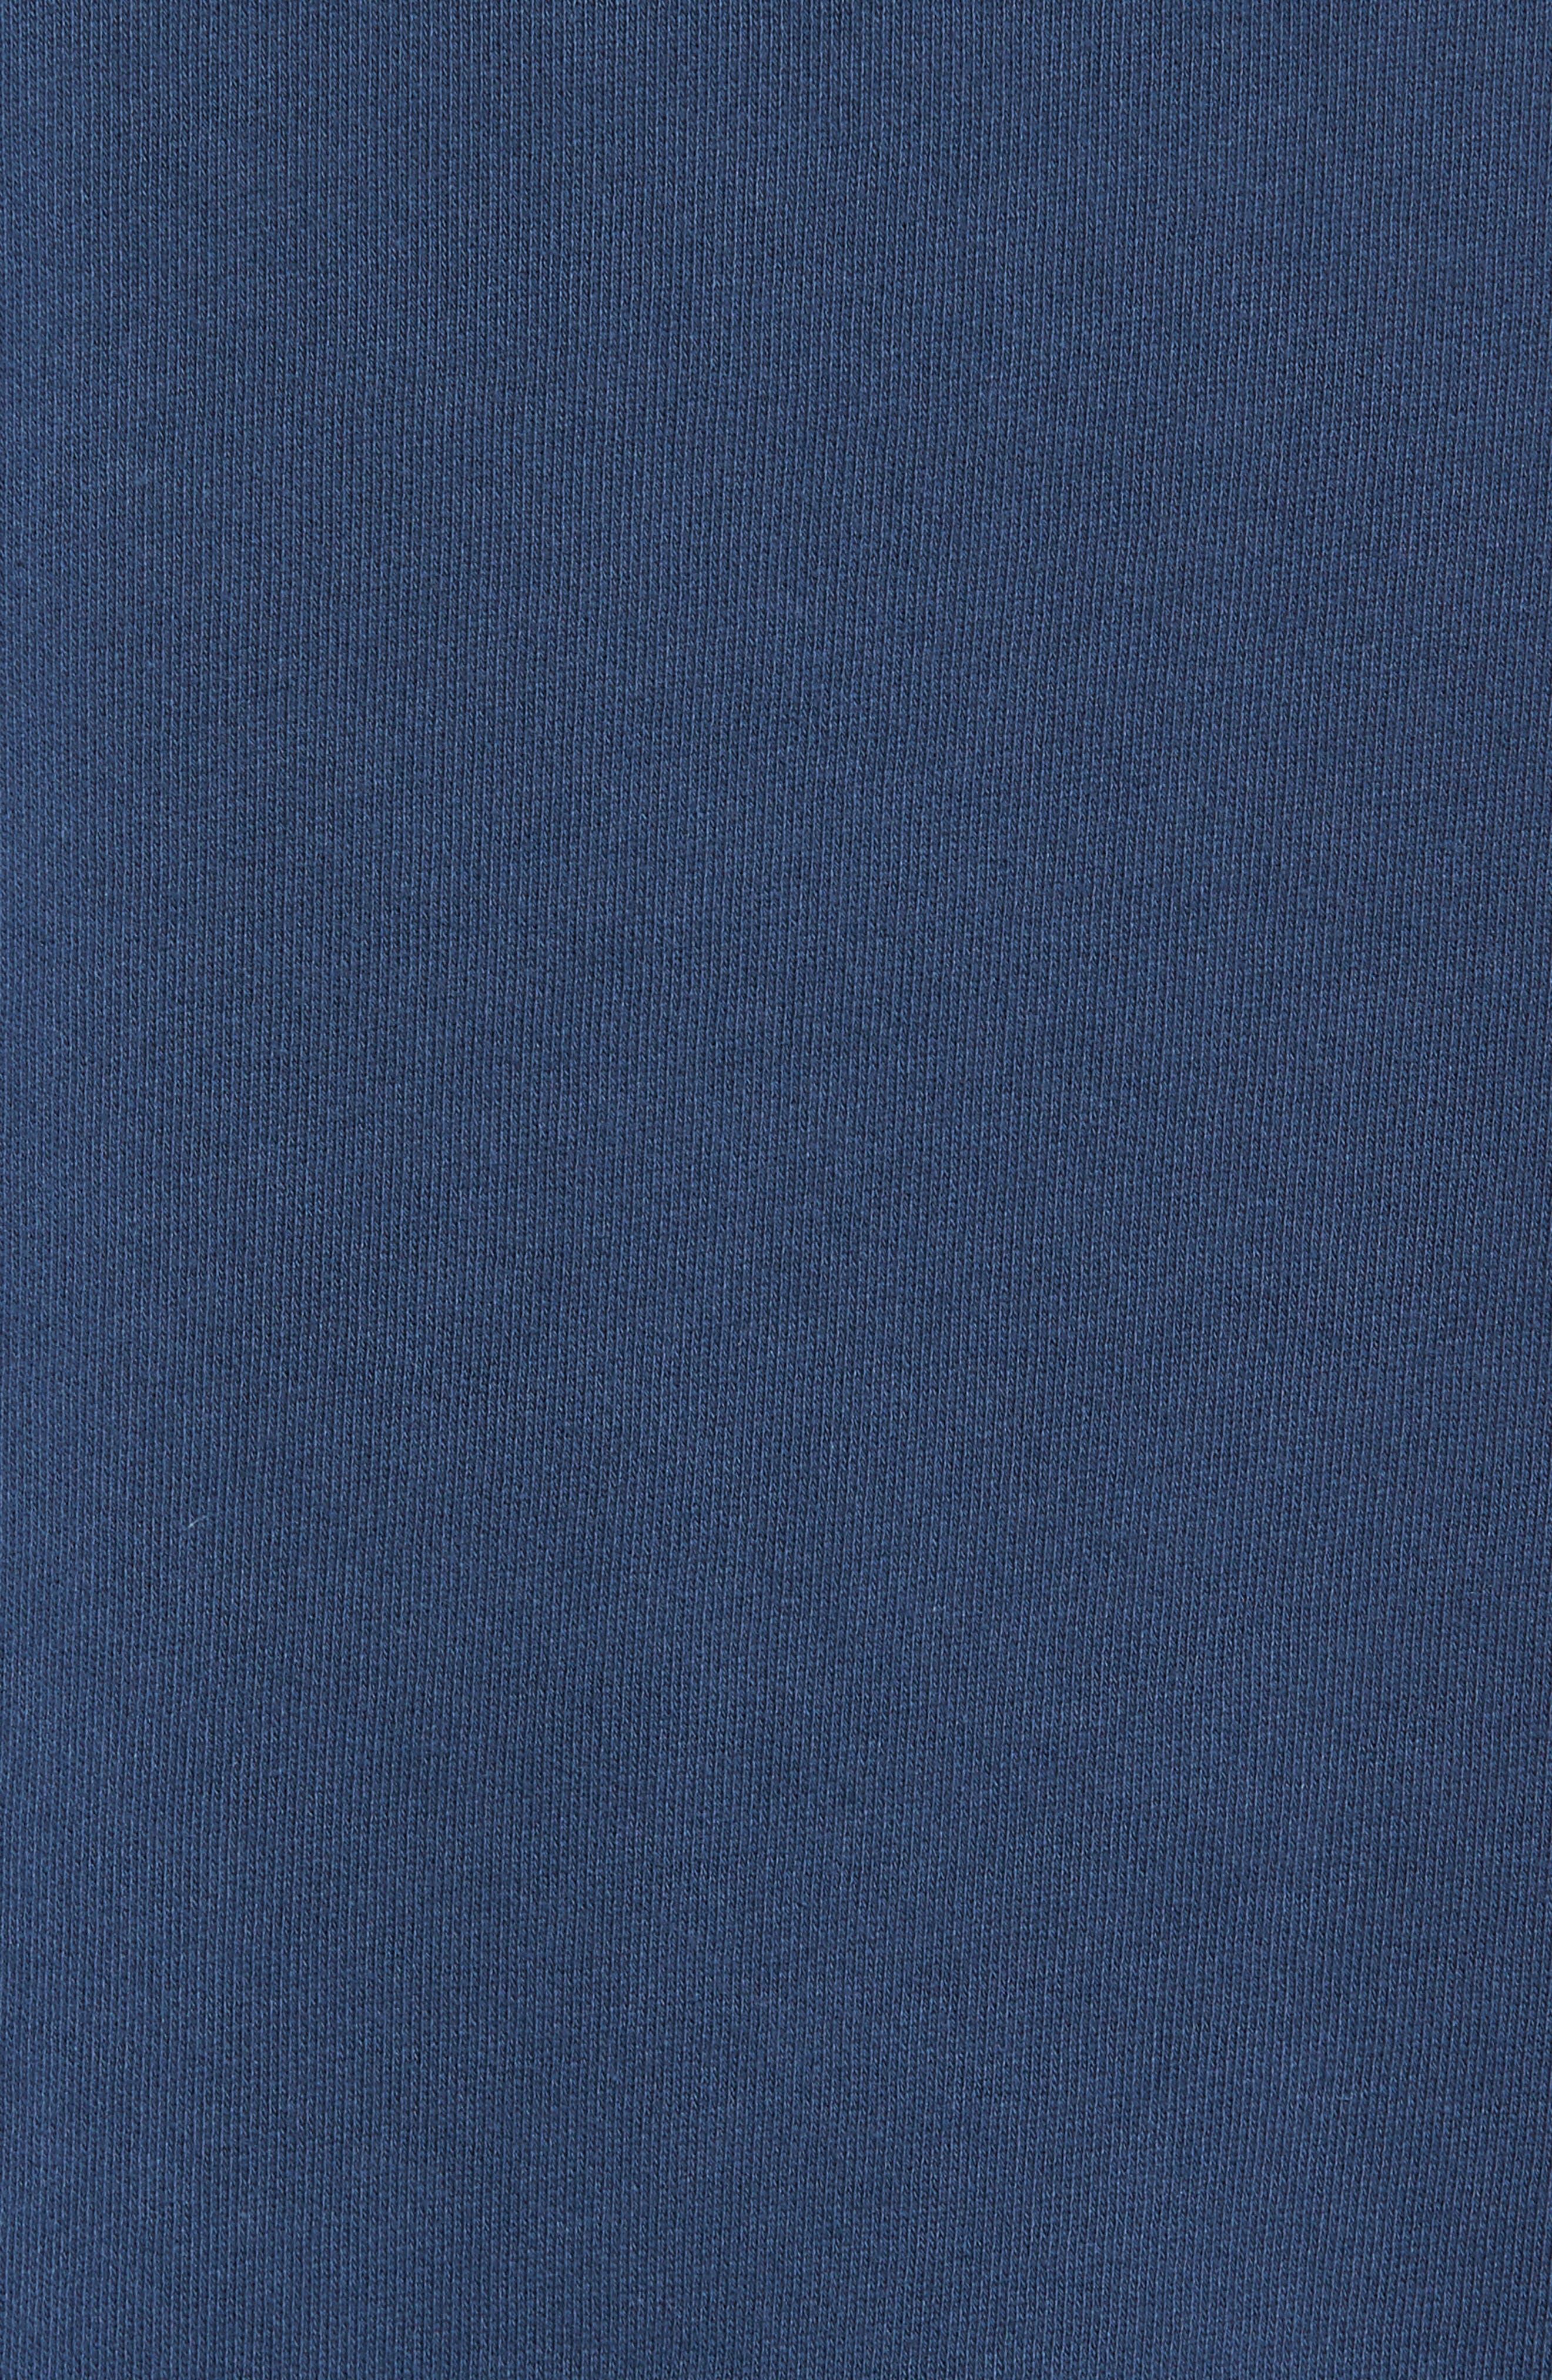 Alternate Image 5  - WeSC Steve Fleece Sweatshirt